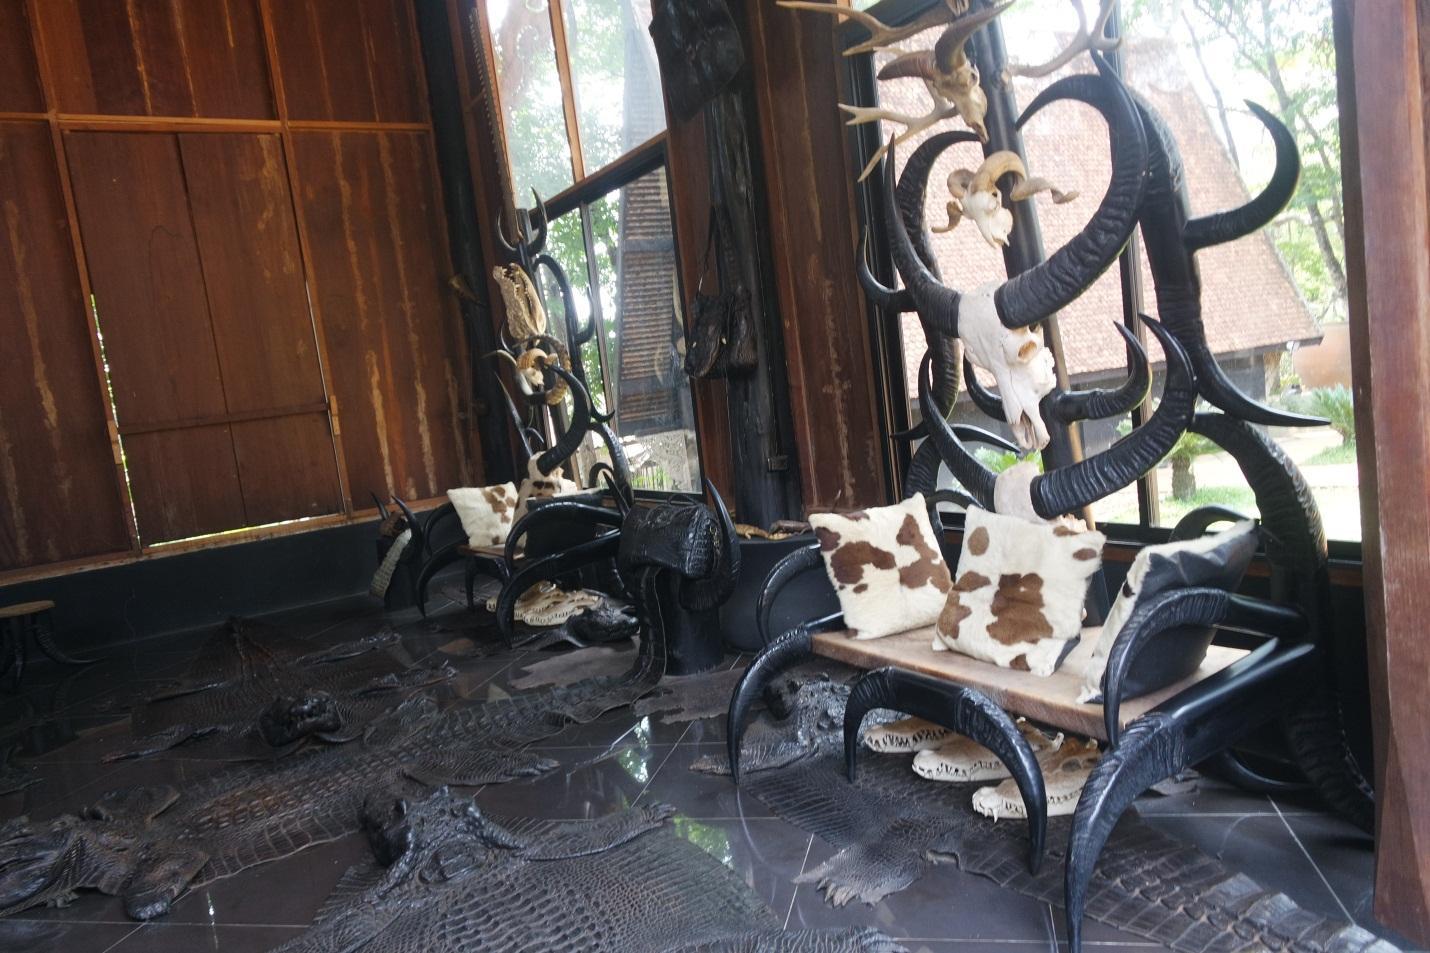 Furniture made from buffalo skulls & horns, cow fur